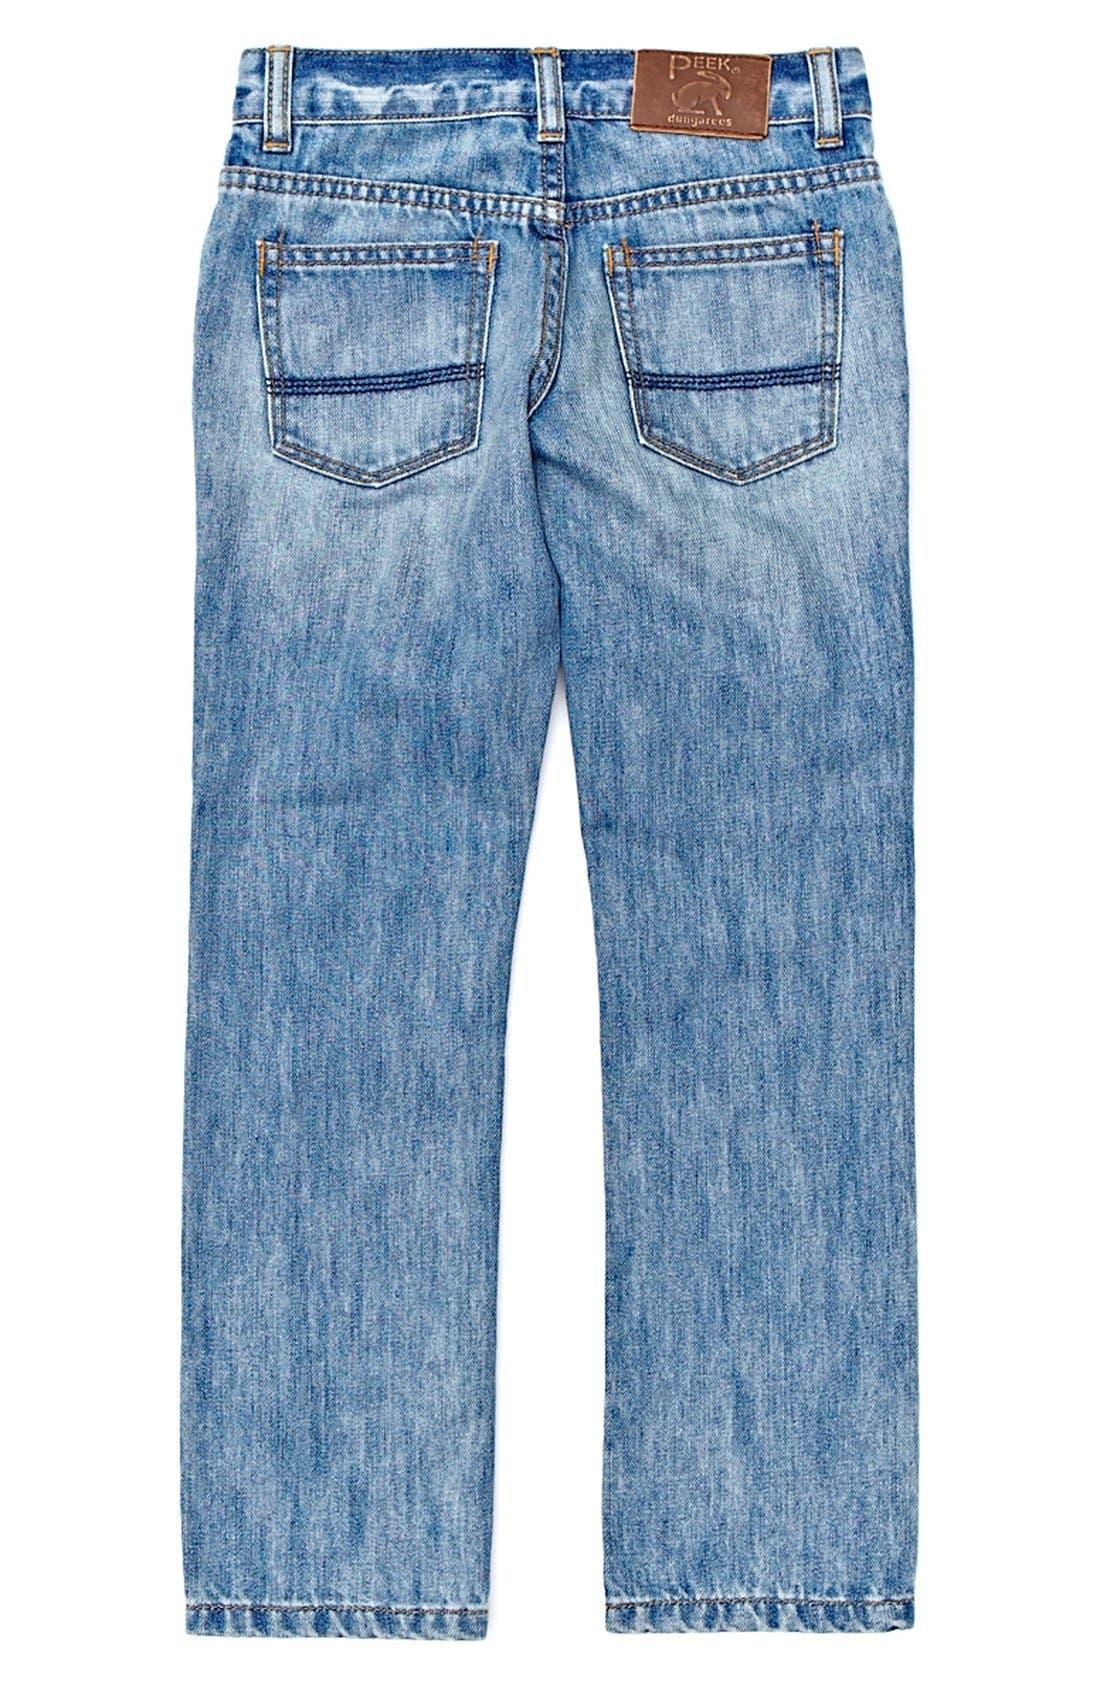 Main Image - Peek 'Slouch' Jeans (Big Boys)